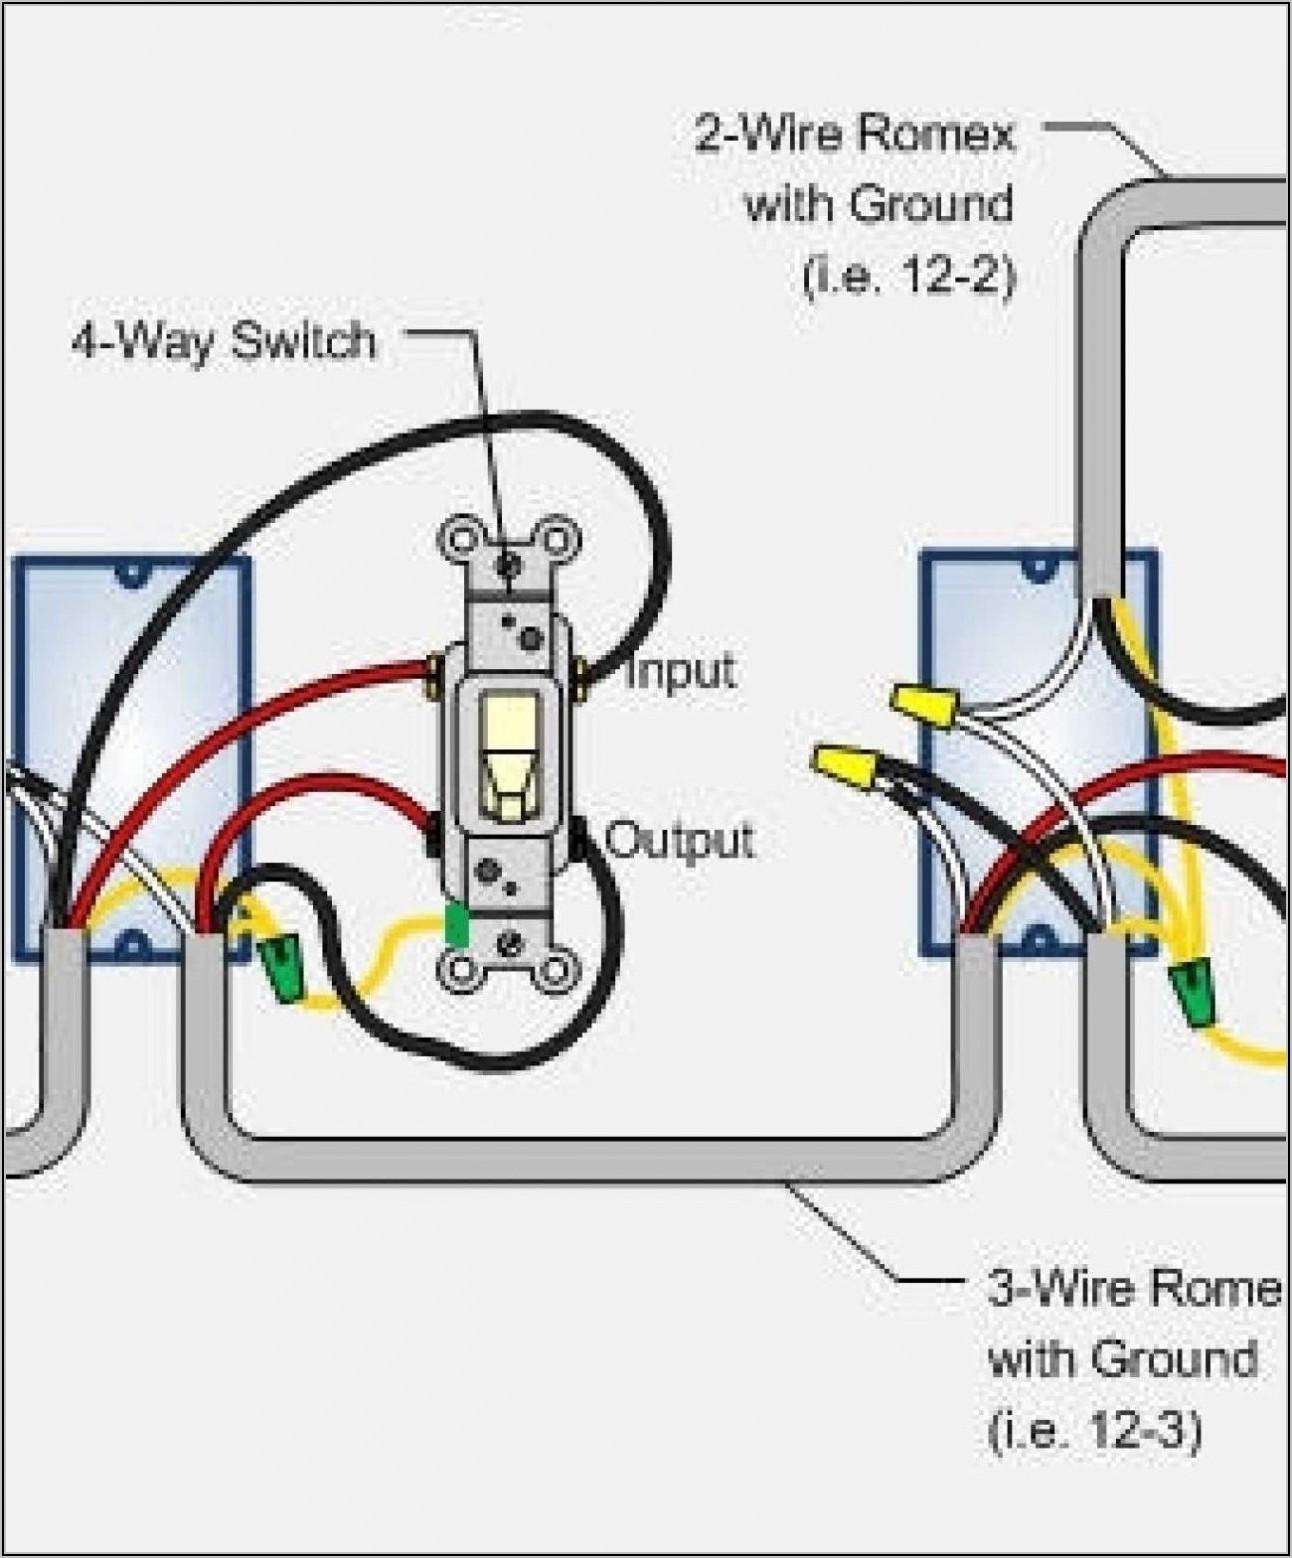 Light Switch Wiring Diagram 1 Way